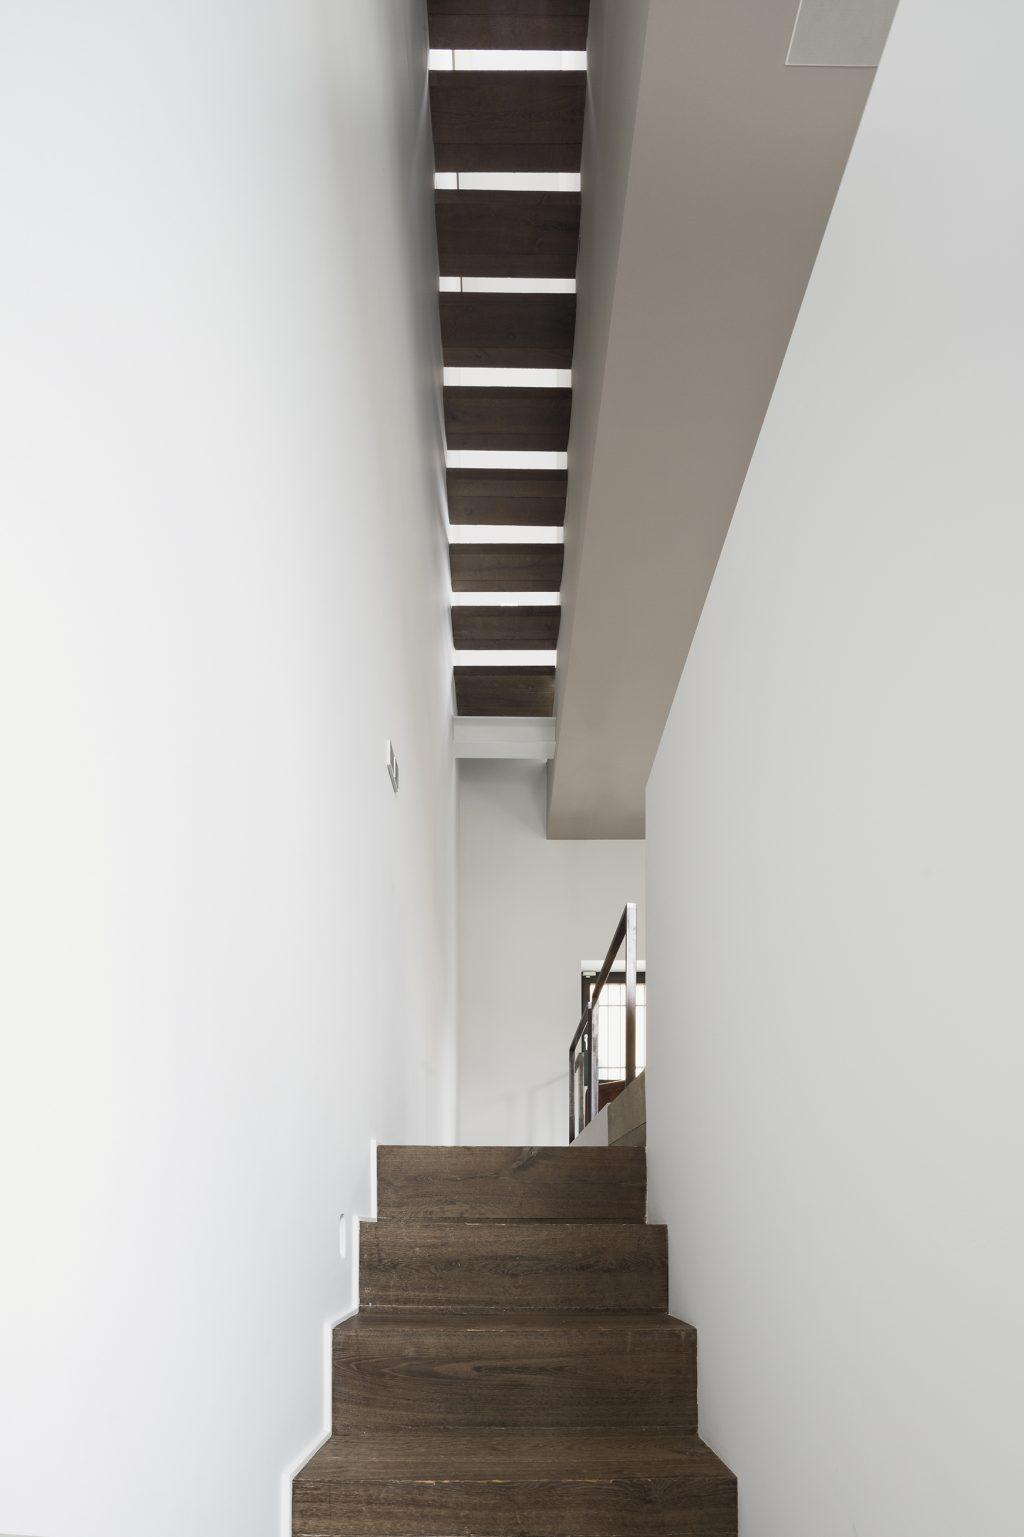 oft verticale Westway Achitects, la scala ad una sola rampa